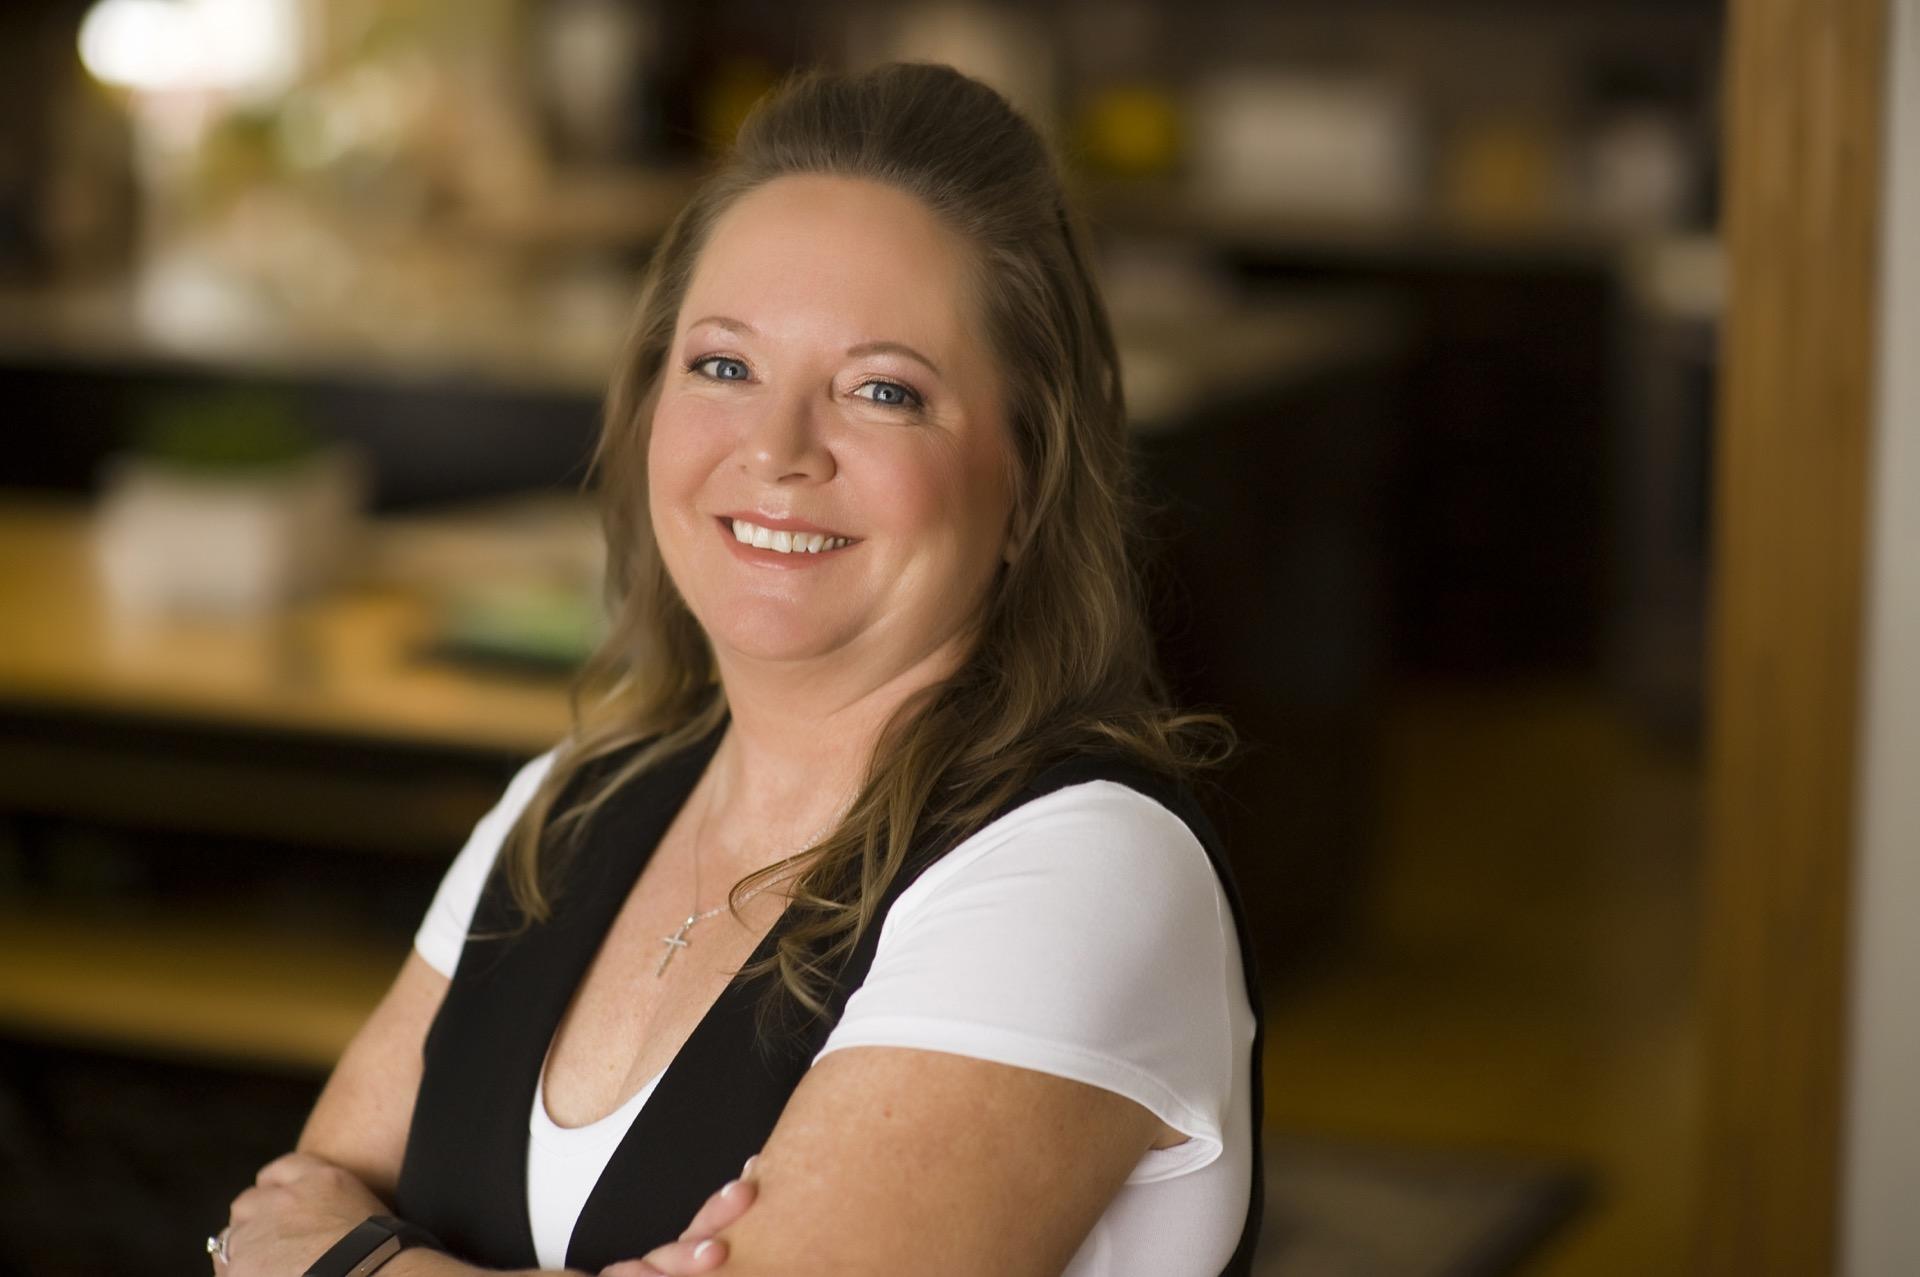 Jennifer Cofer Organizer, Jennifer Cofer Business, Jennifer Coffer Organization